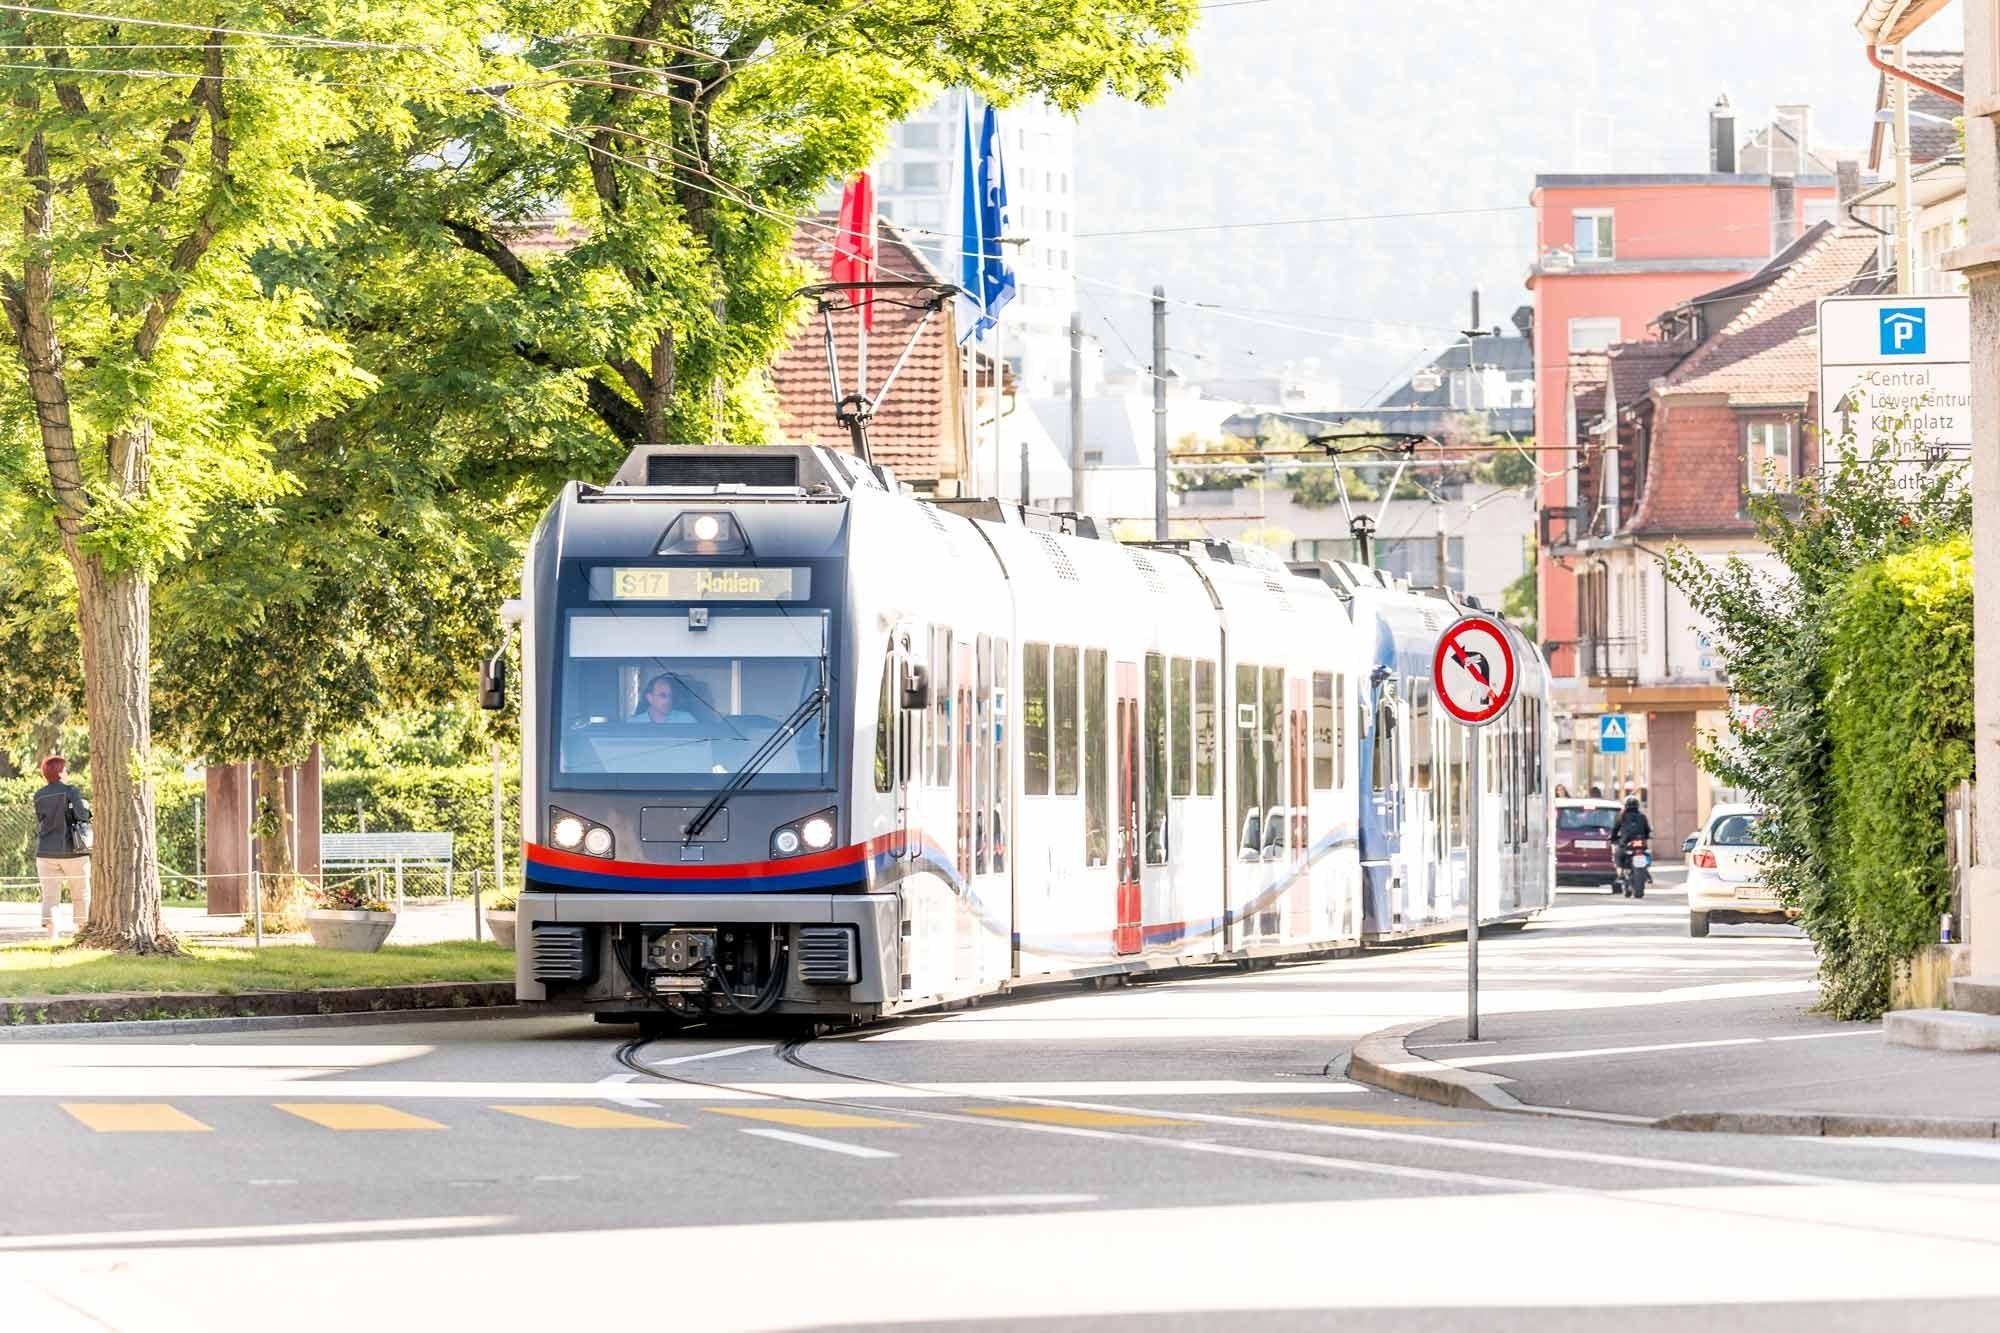 Bremgarten-Dietikon-Bahn in Dietikon